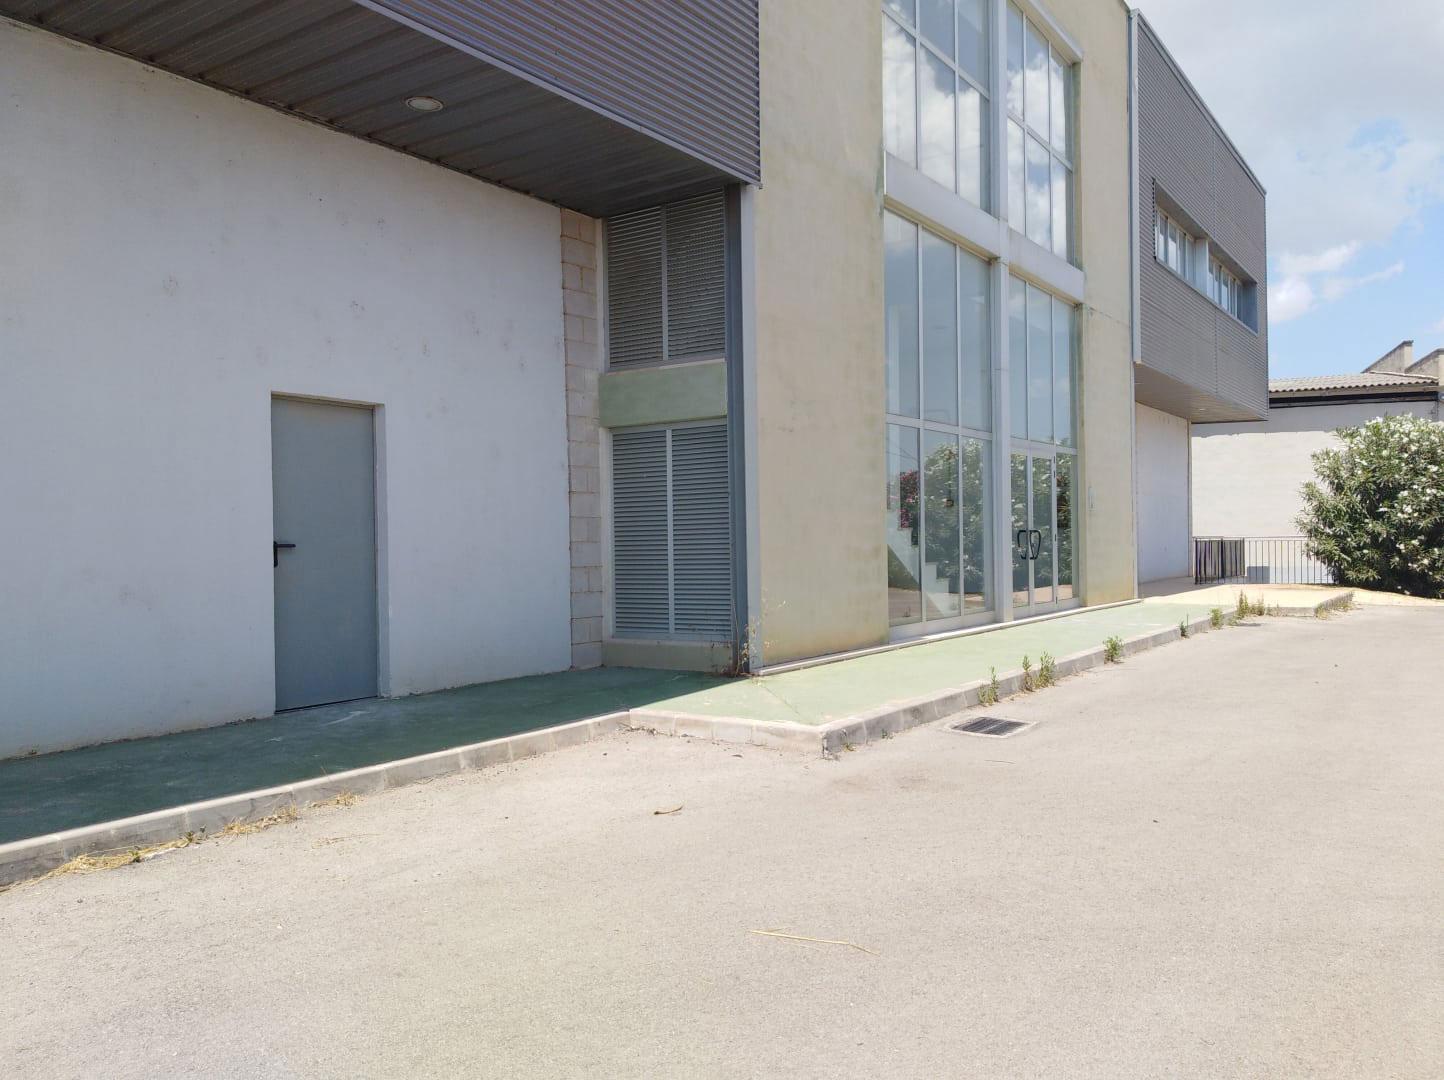 Oficina en venta en Porreres, Baleares, Carretera Campos, 70.000 €, 172 m2